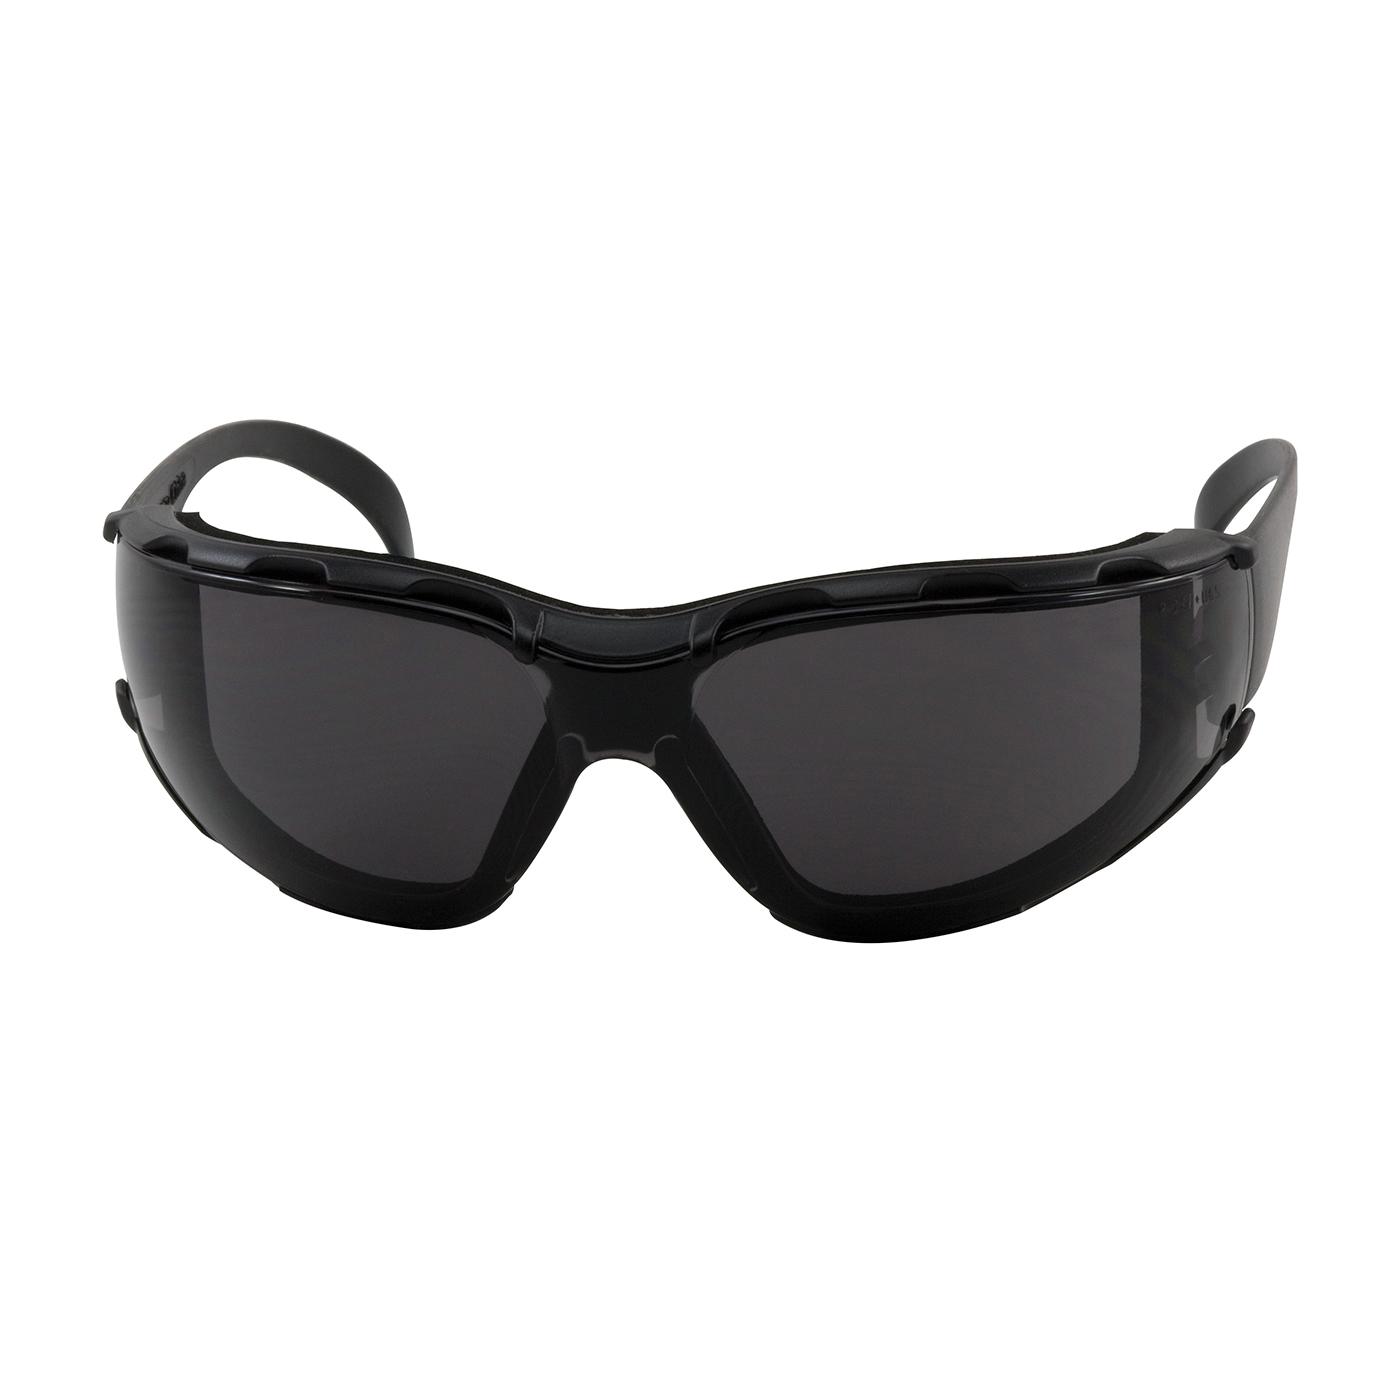 Bouton® 250-01-F021 Zenon Z12™ Foam 250-01 Single Lens Safety Glasses, Anti-Fog/Anti-Scratch, Gray Lens, Rimless Frame, Black, Polycarbonate Frame, Polycarbonate Lens, ANSI Z87.1+